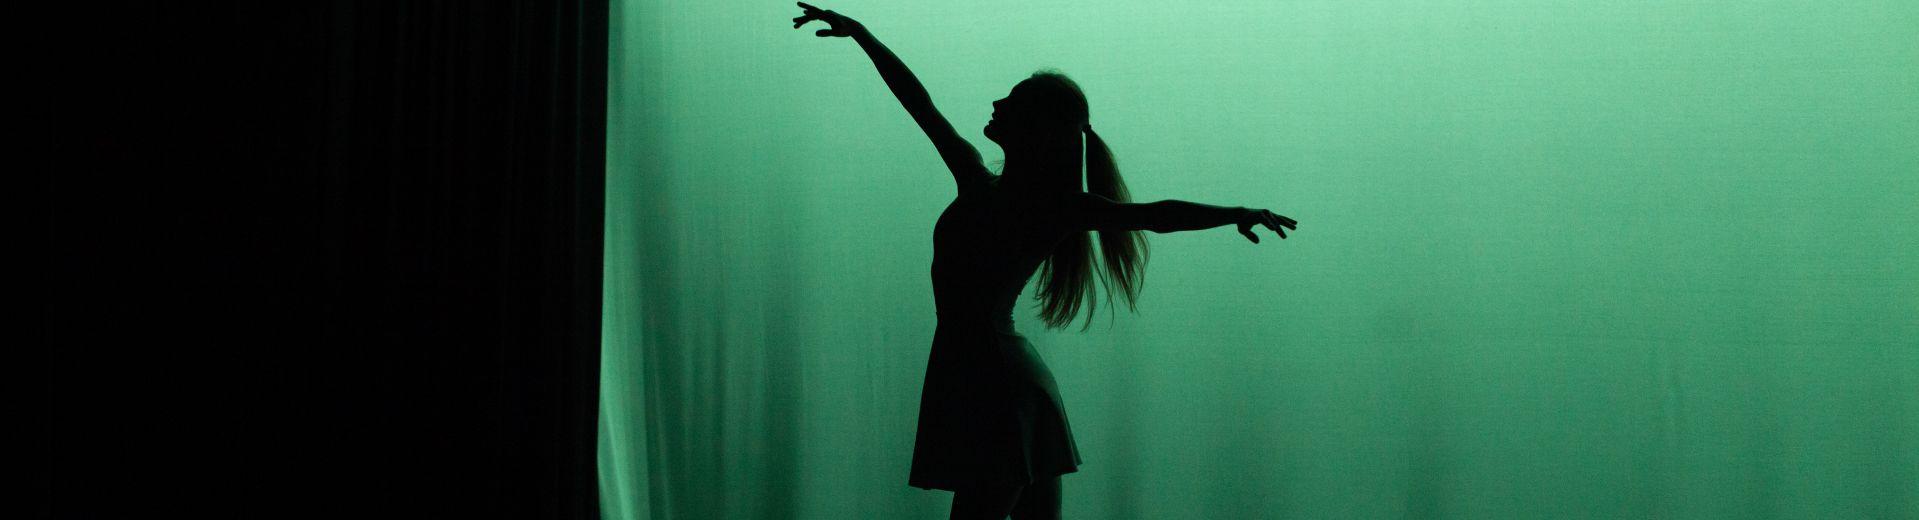 Full-body silhouette of ballet dancer, backlit on stage